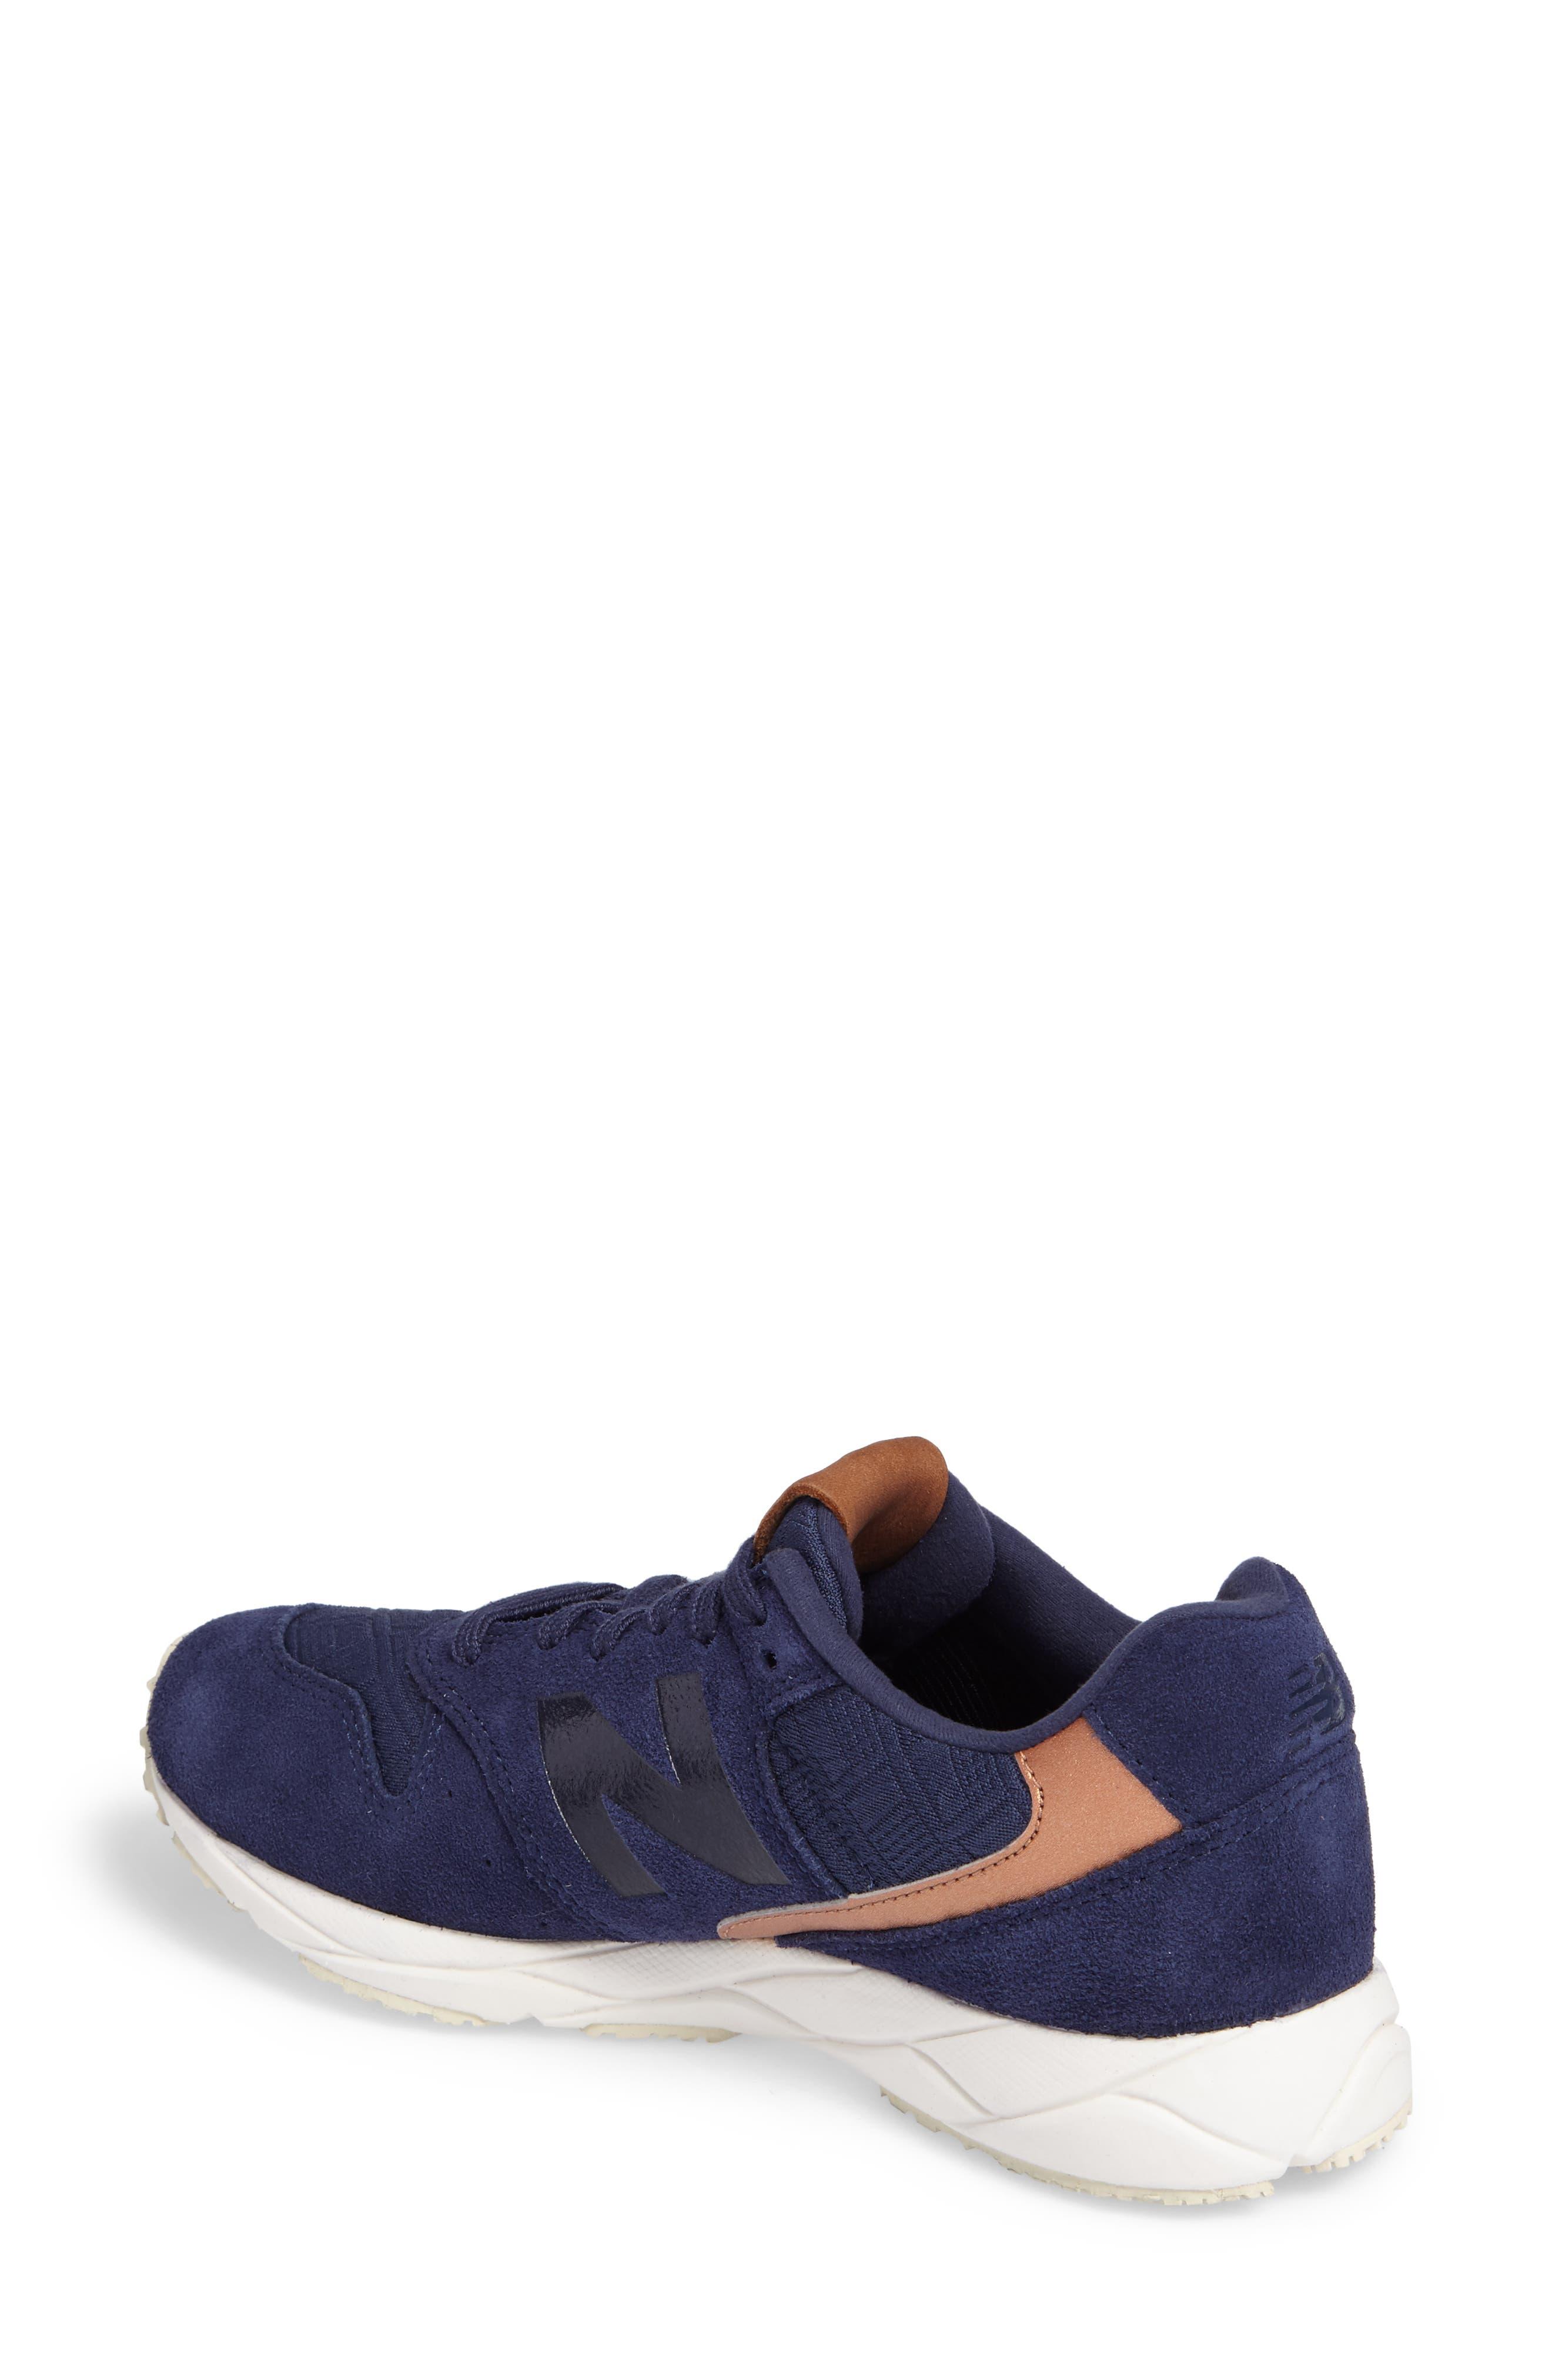 96 Mash-Up Sneaker,                             Alternate thumbnail 9, color,